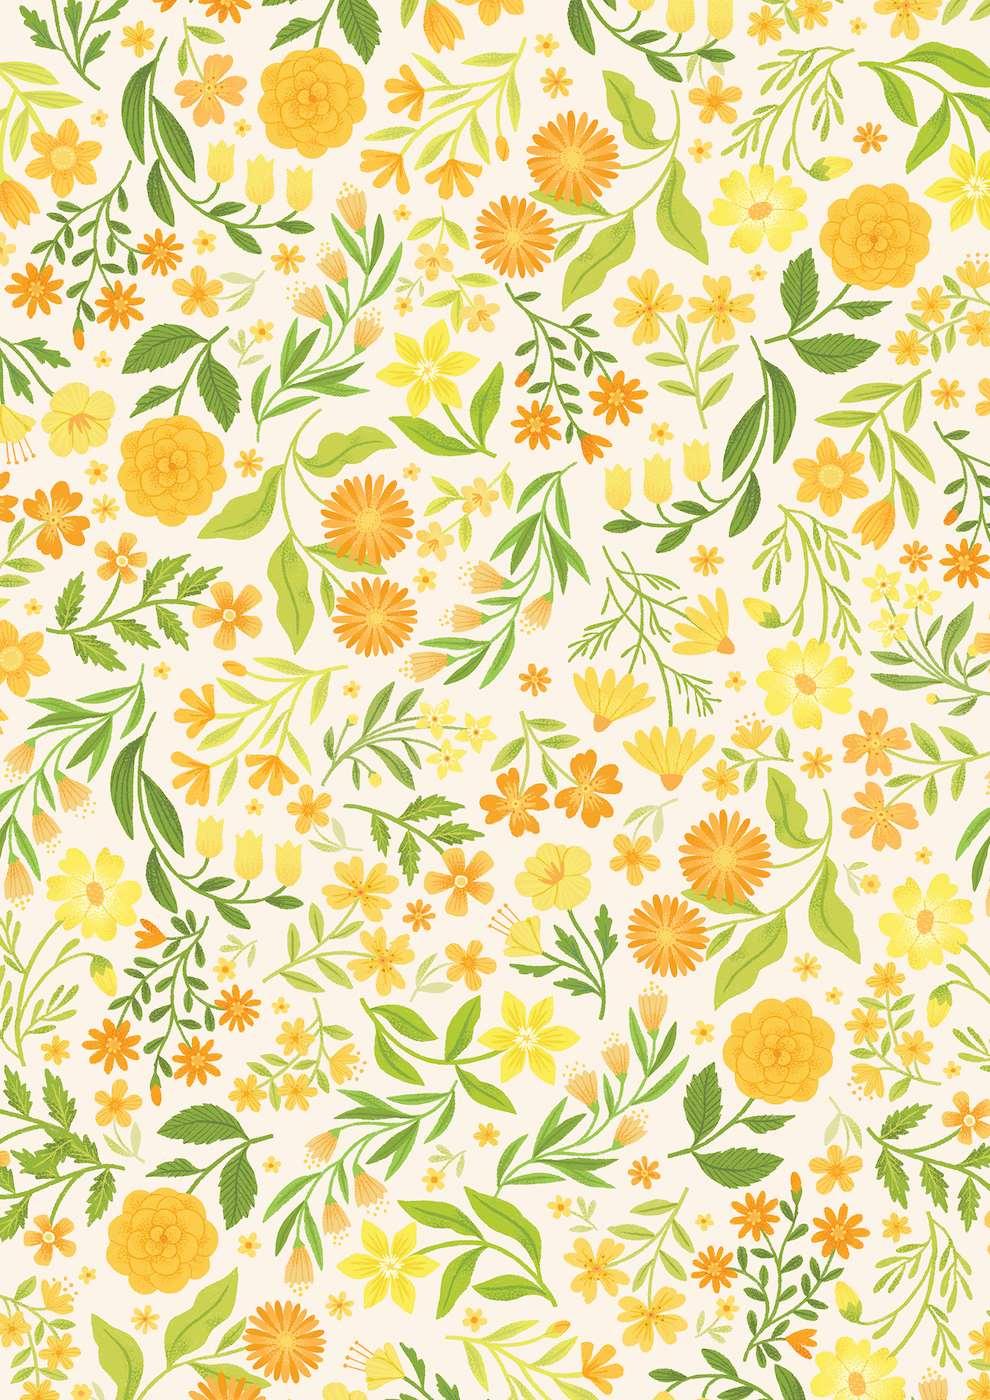 Tatiana Boyko, Handpainted yellow botanical pattern illustration for packaging.